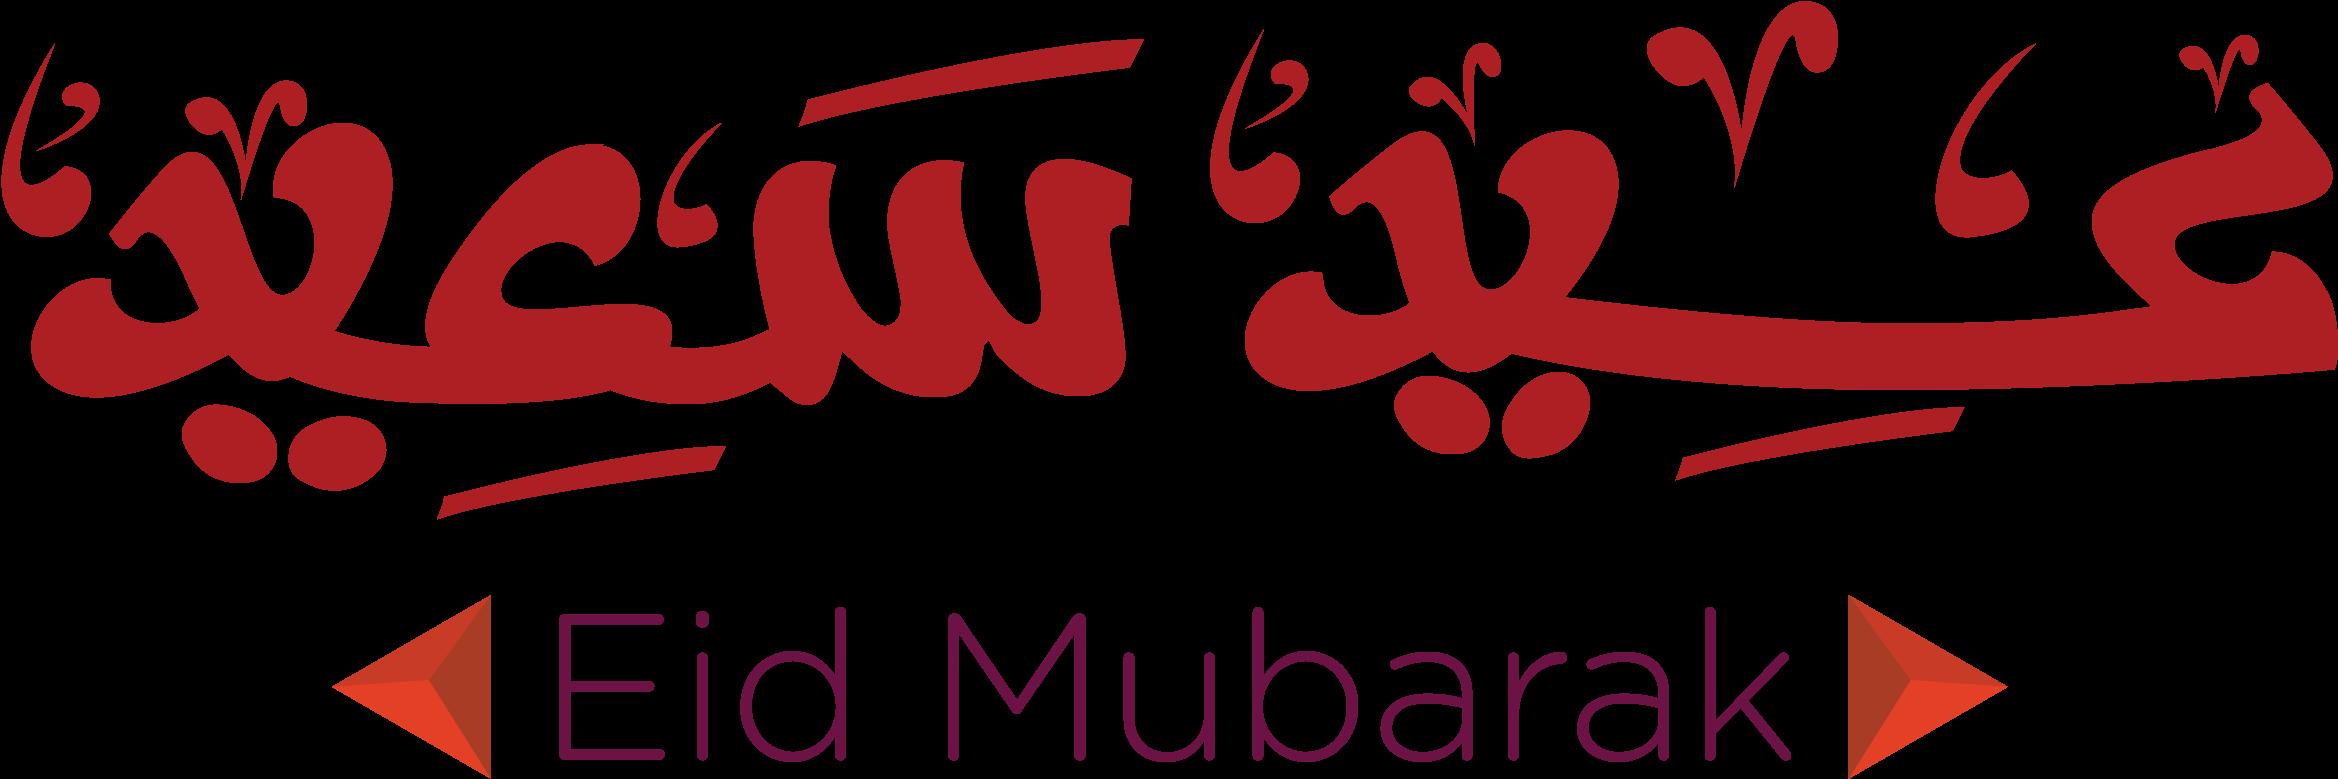 Eid Png - عيد اضحى مبارك Png | Full Size PNG Download | SeekPNG